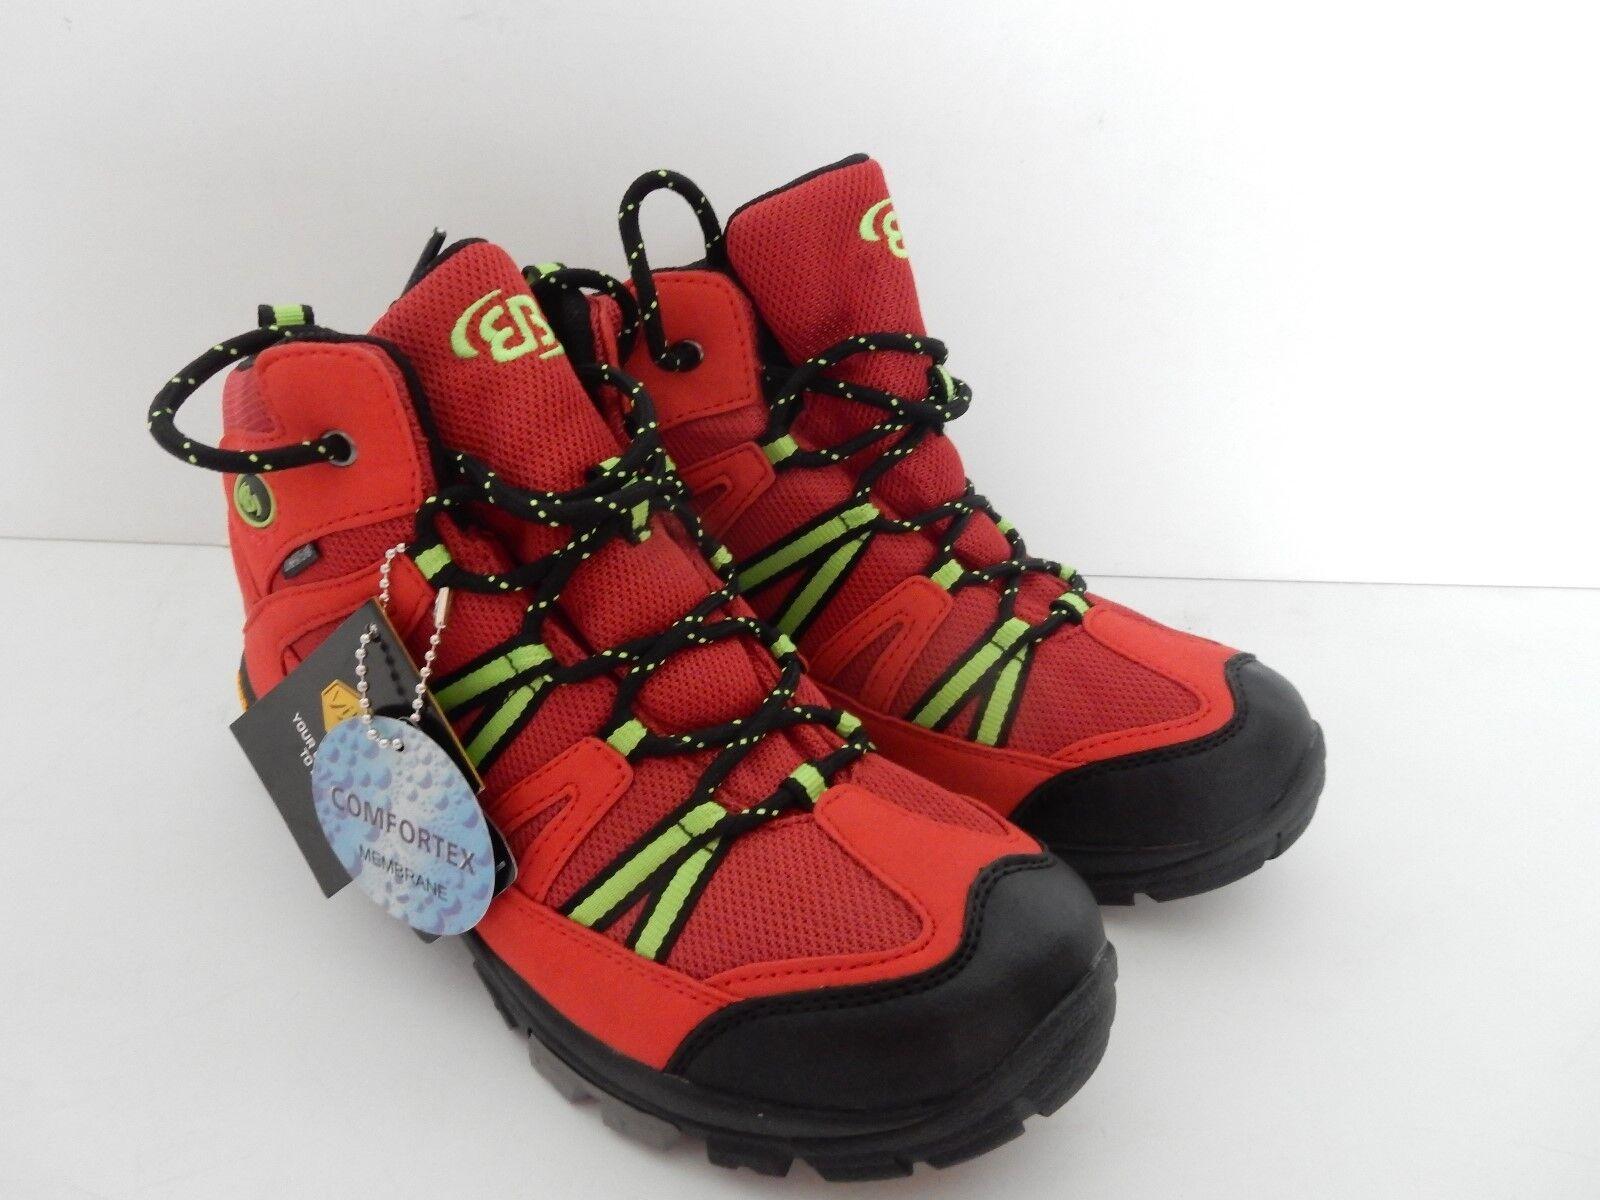 Brütting Ohio High Trekking-& Wanderstiefel Schuhe Stiefel Stiefel Stiefel Größe 39 ffbfc9